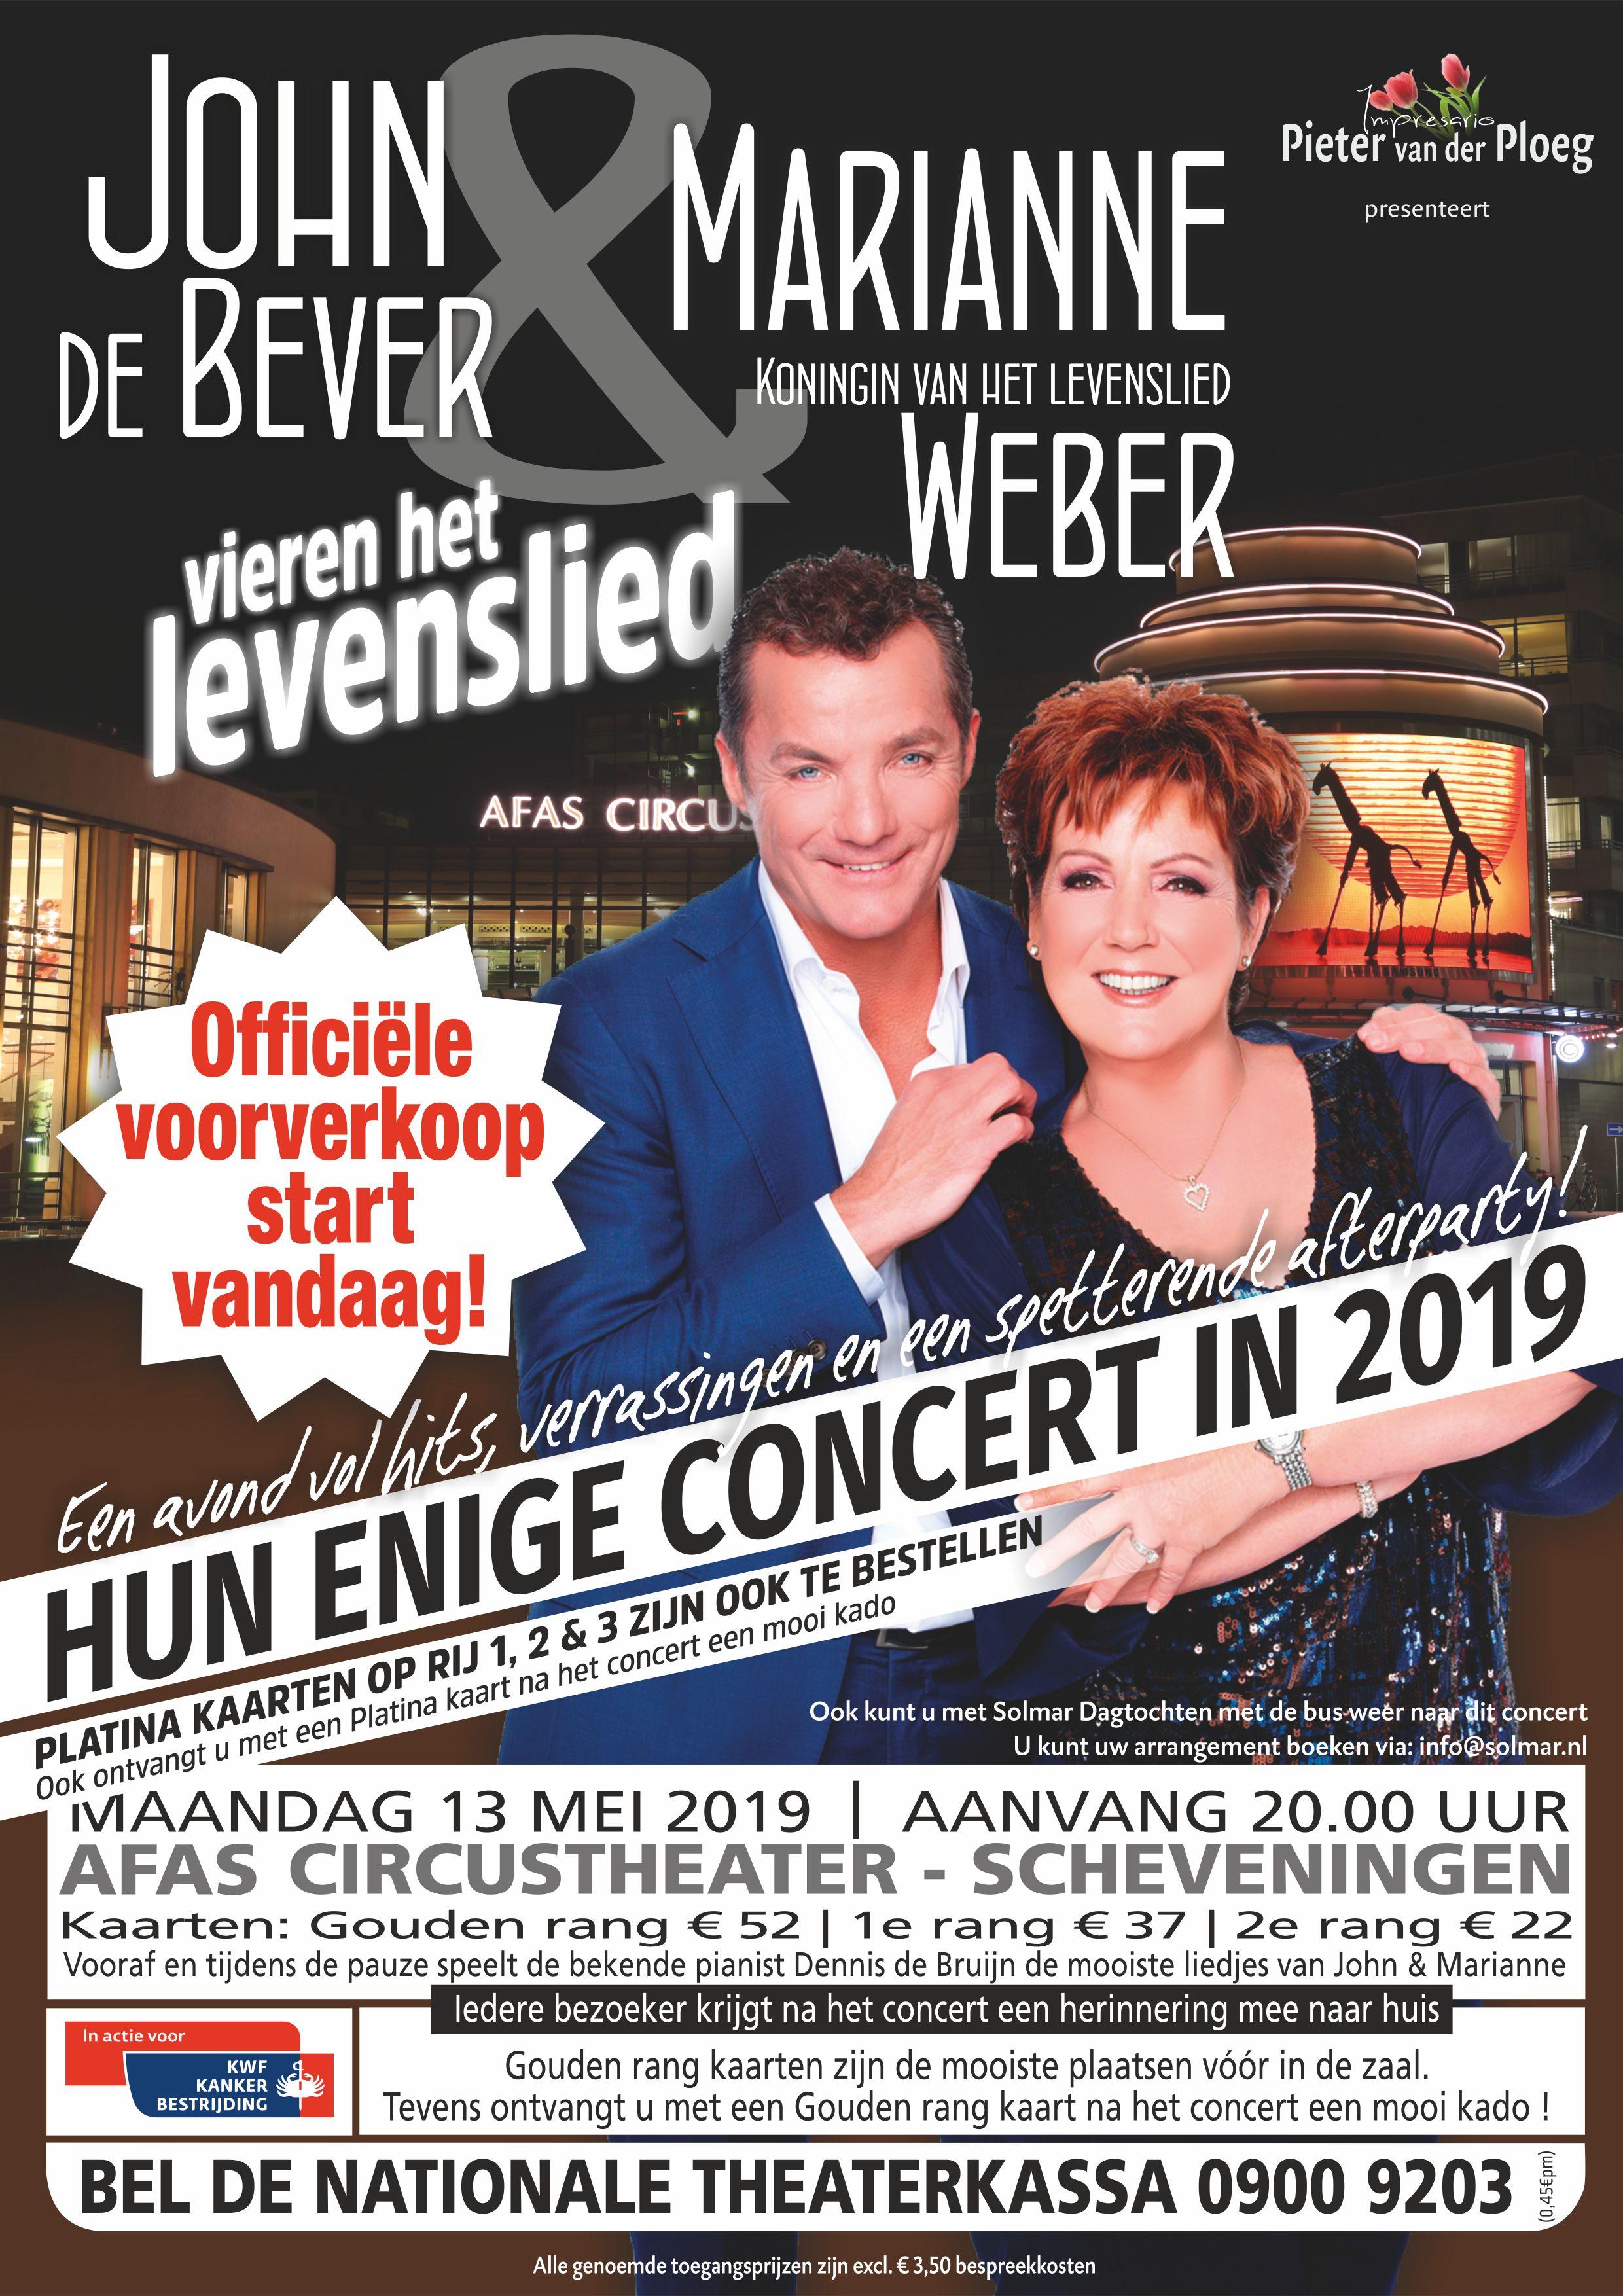 concert john de bever 2018